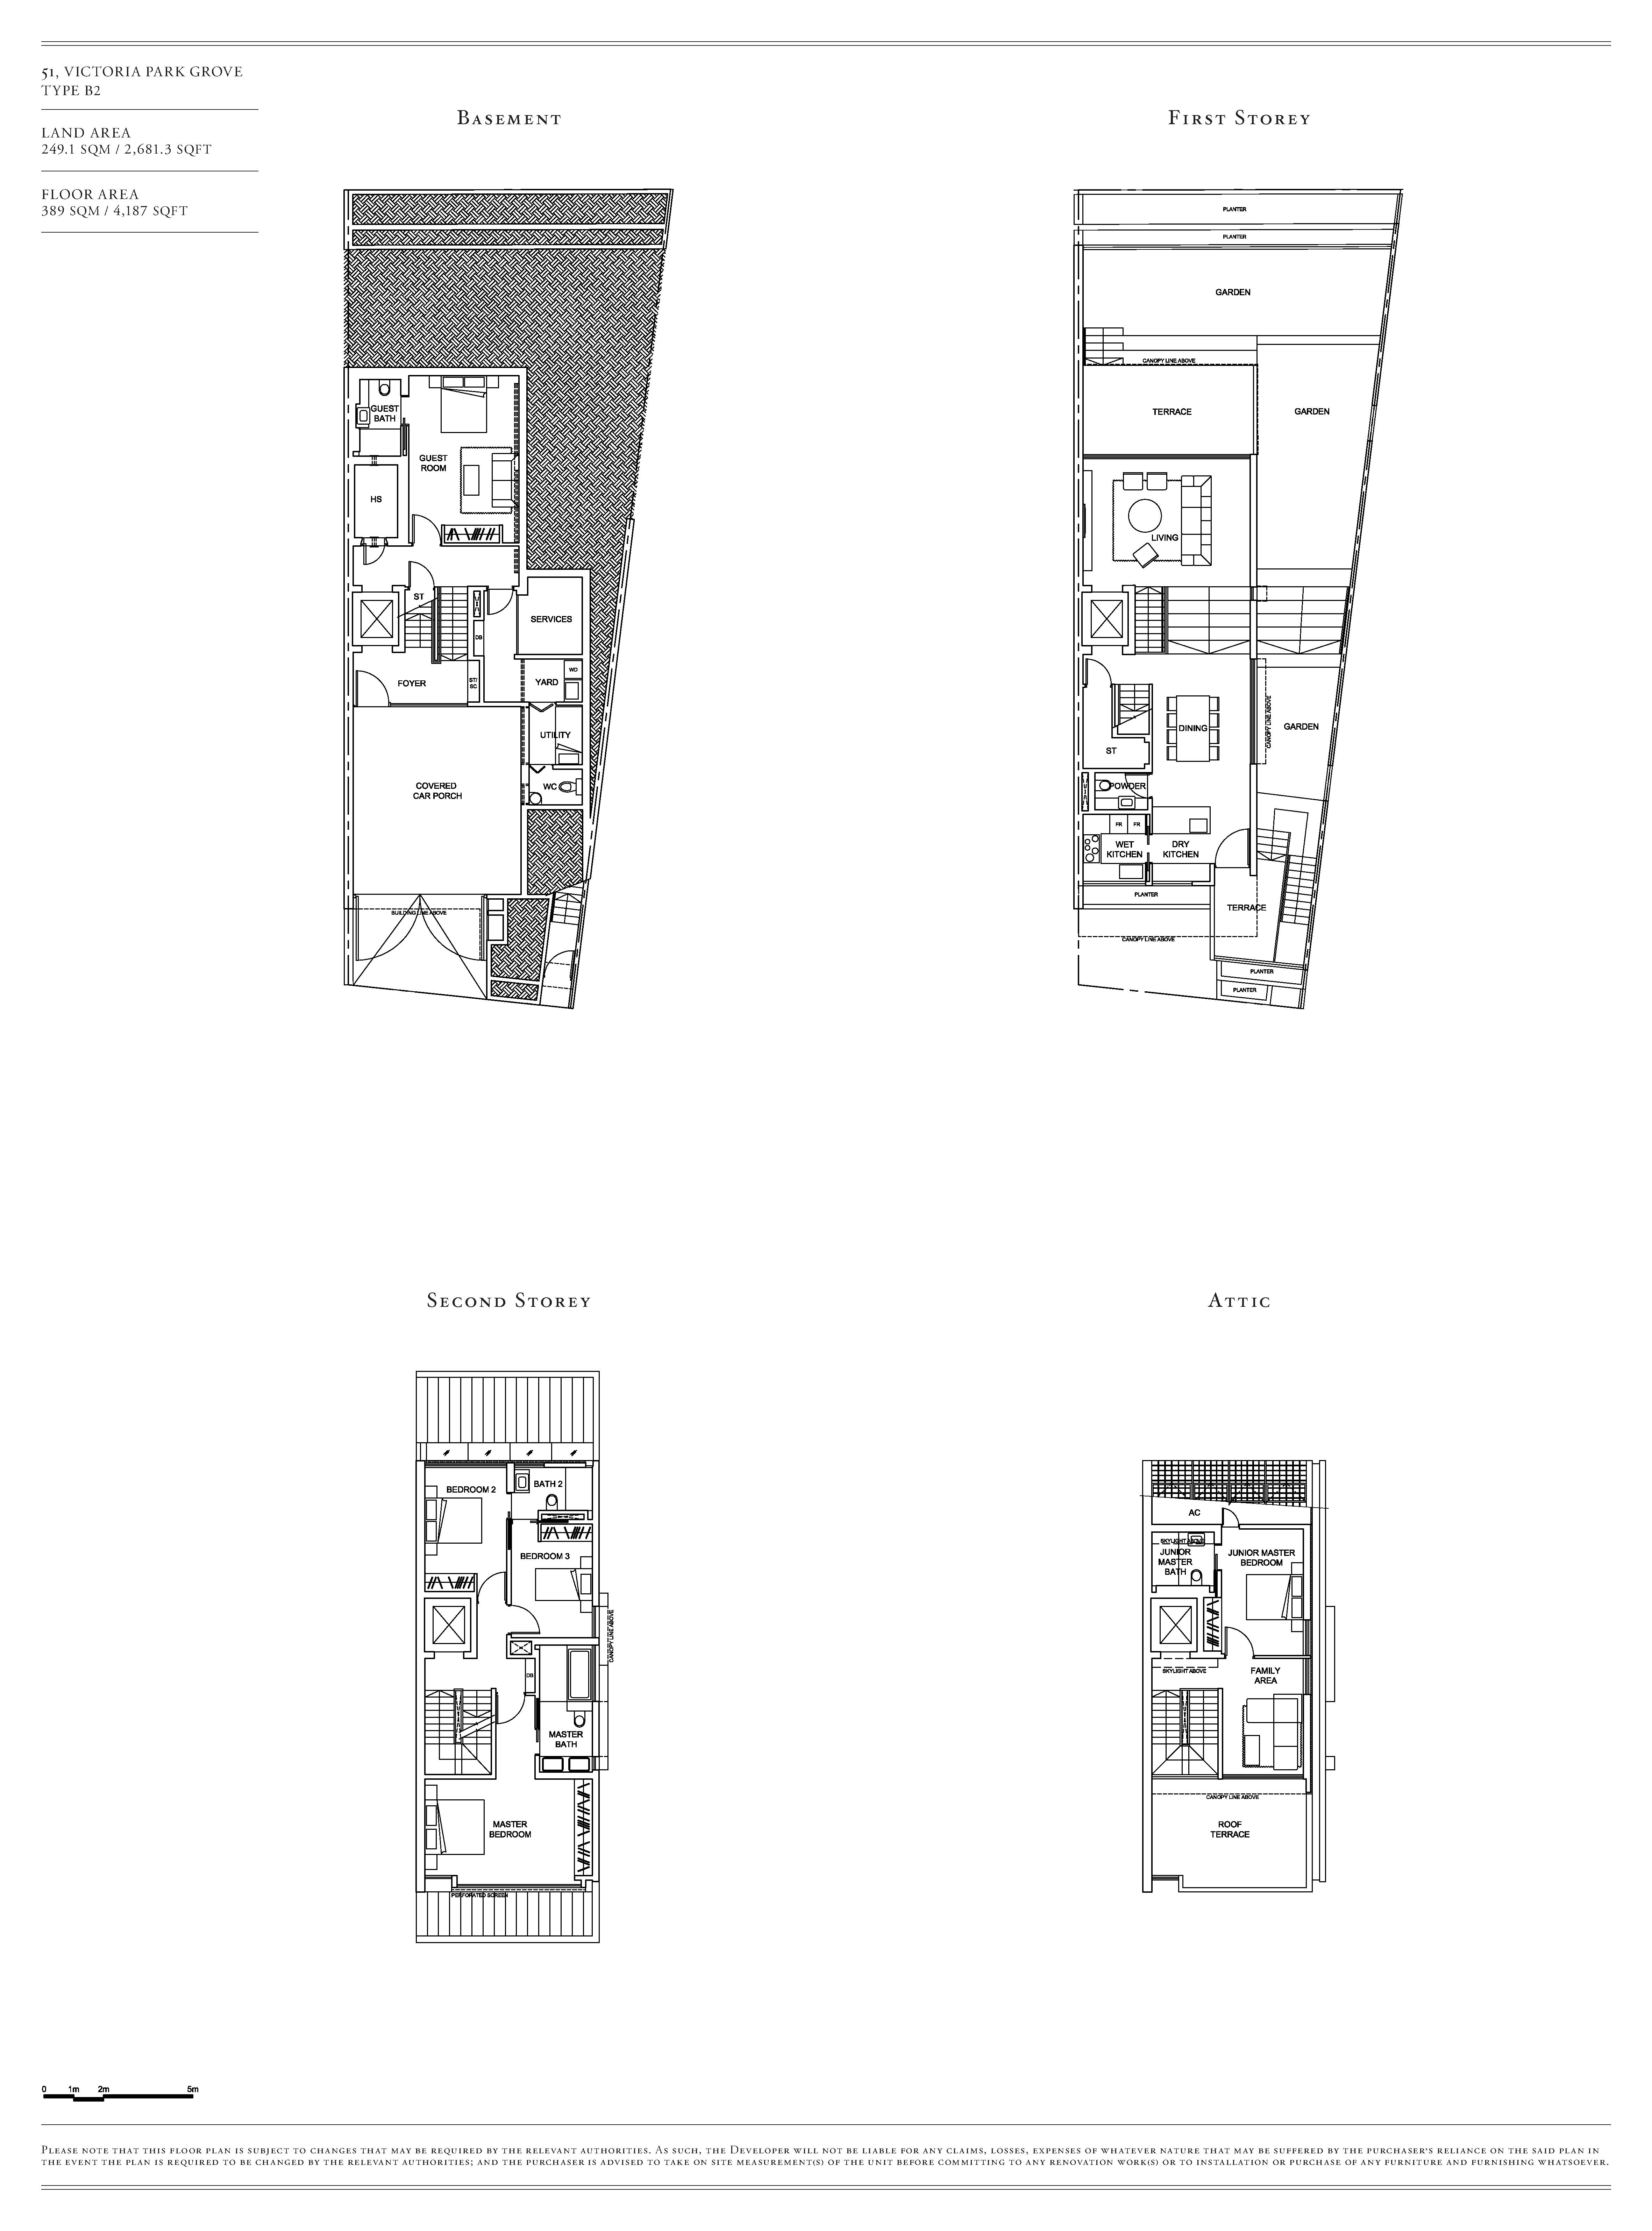 Victoria Park Villas House 51 Type B2 Floor Plans